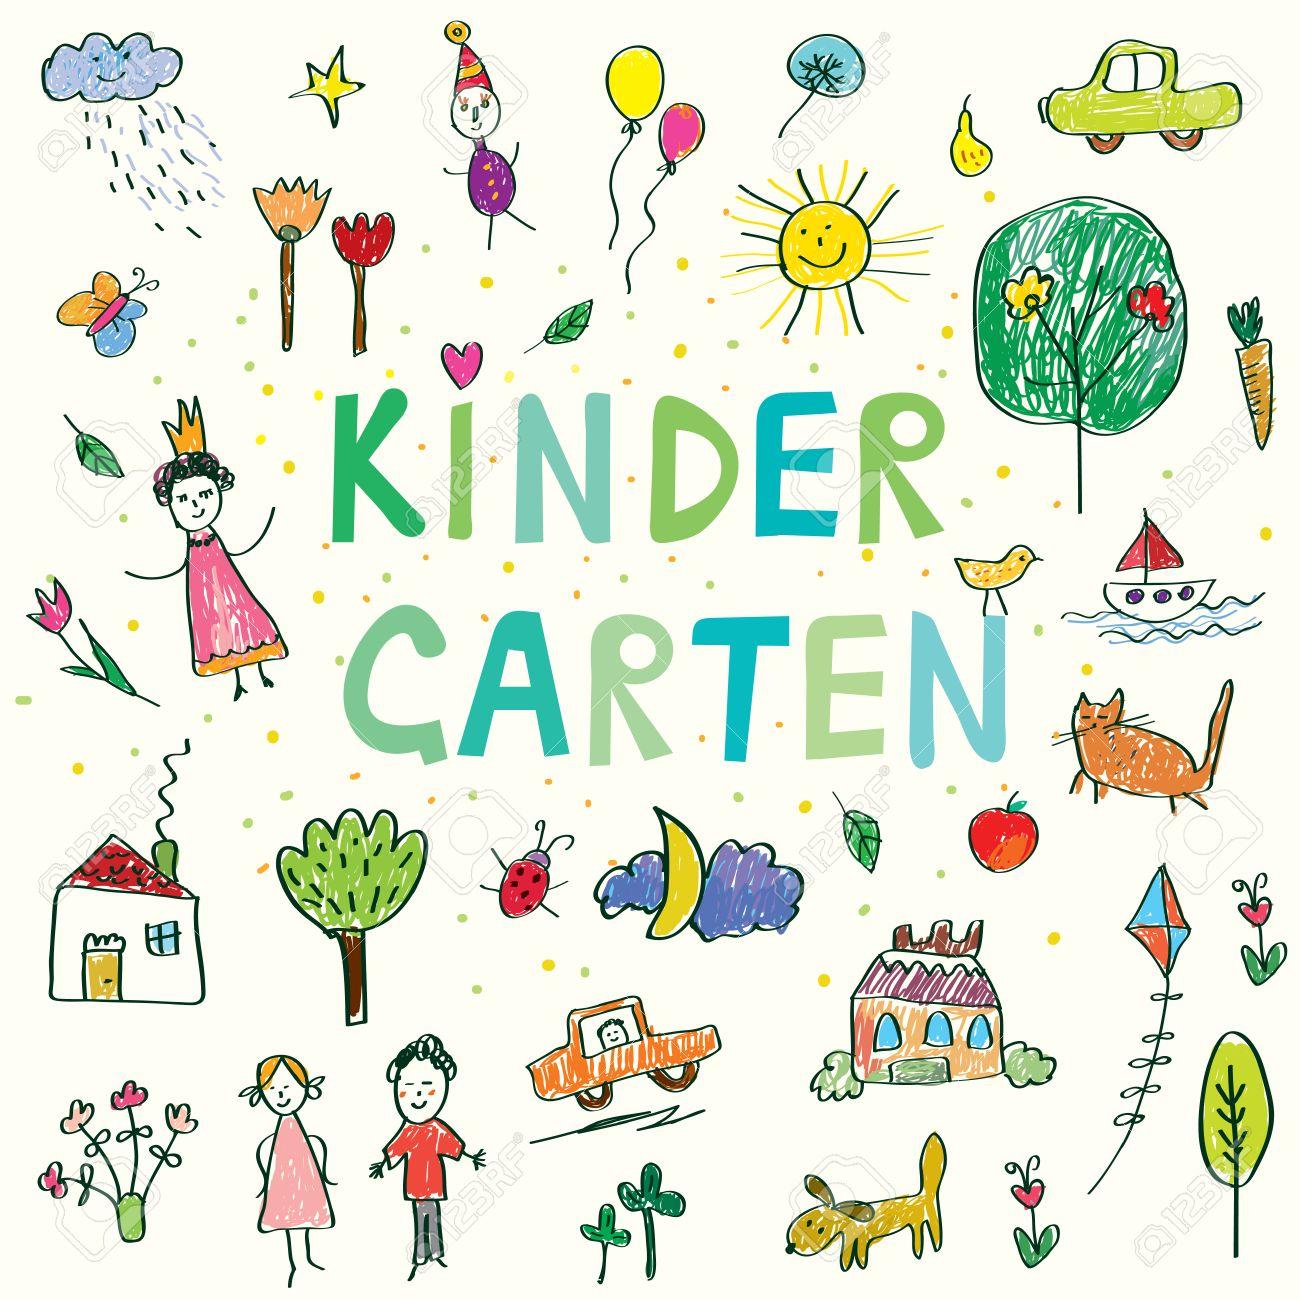 Kindergarten banner with funny kids drawing - vector design - 53893414